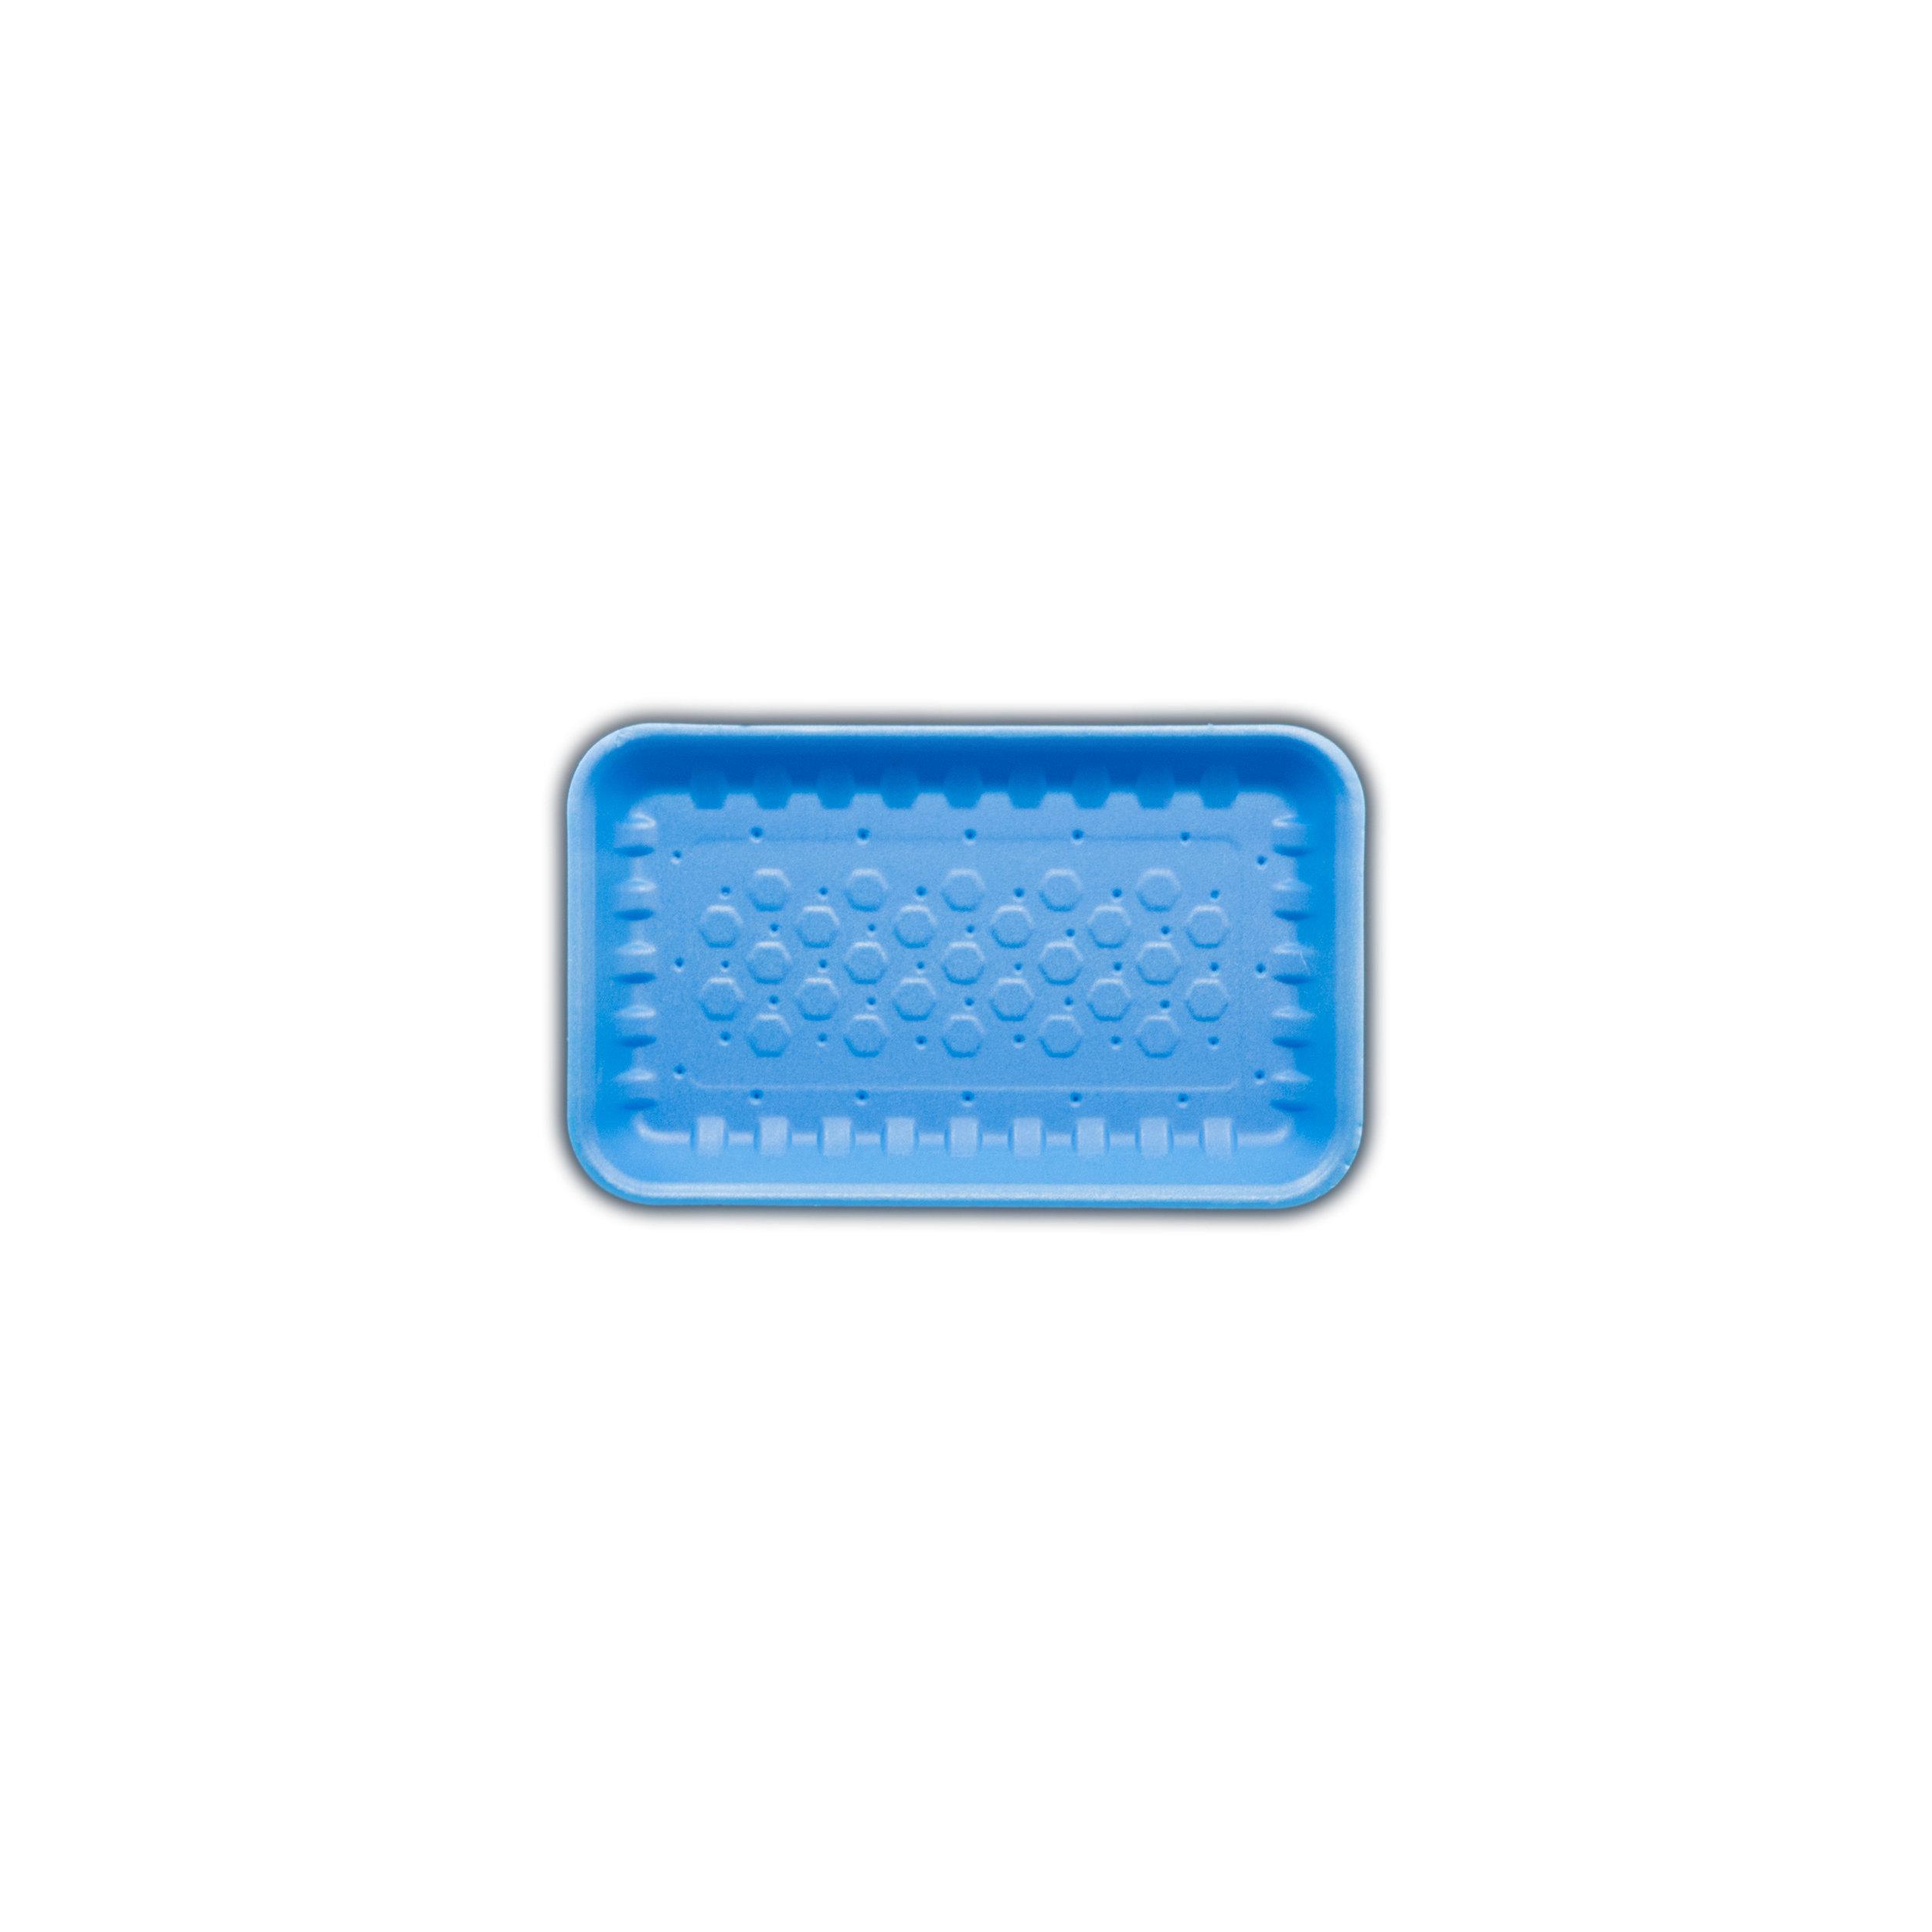 iK-0633      OPEN CELL 25mm blue 10x6    90 per sleeve 360 per carton